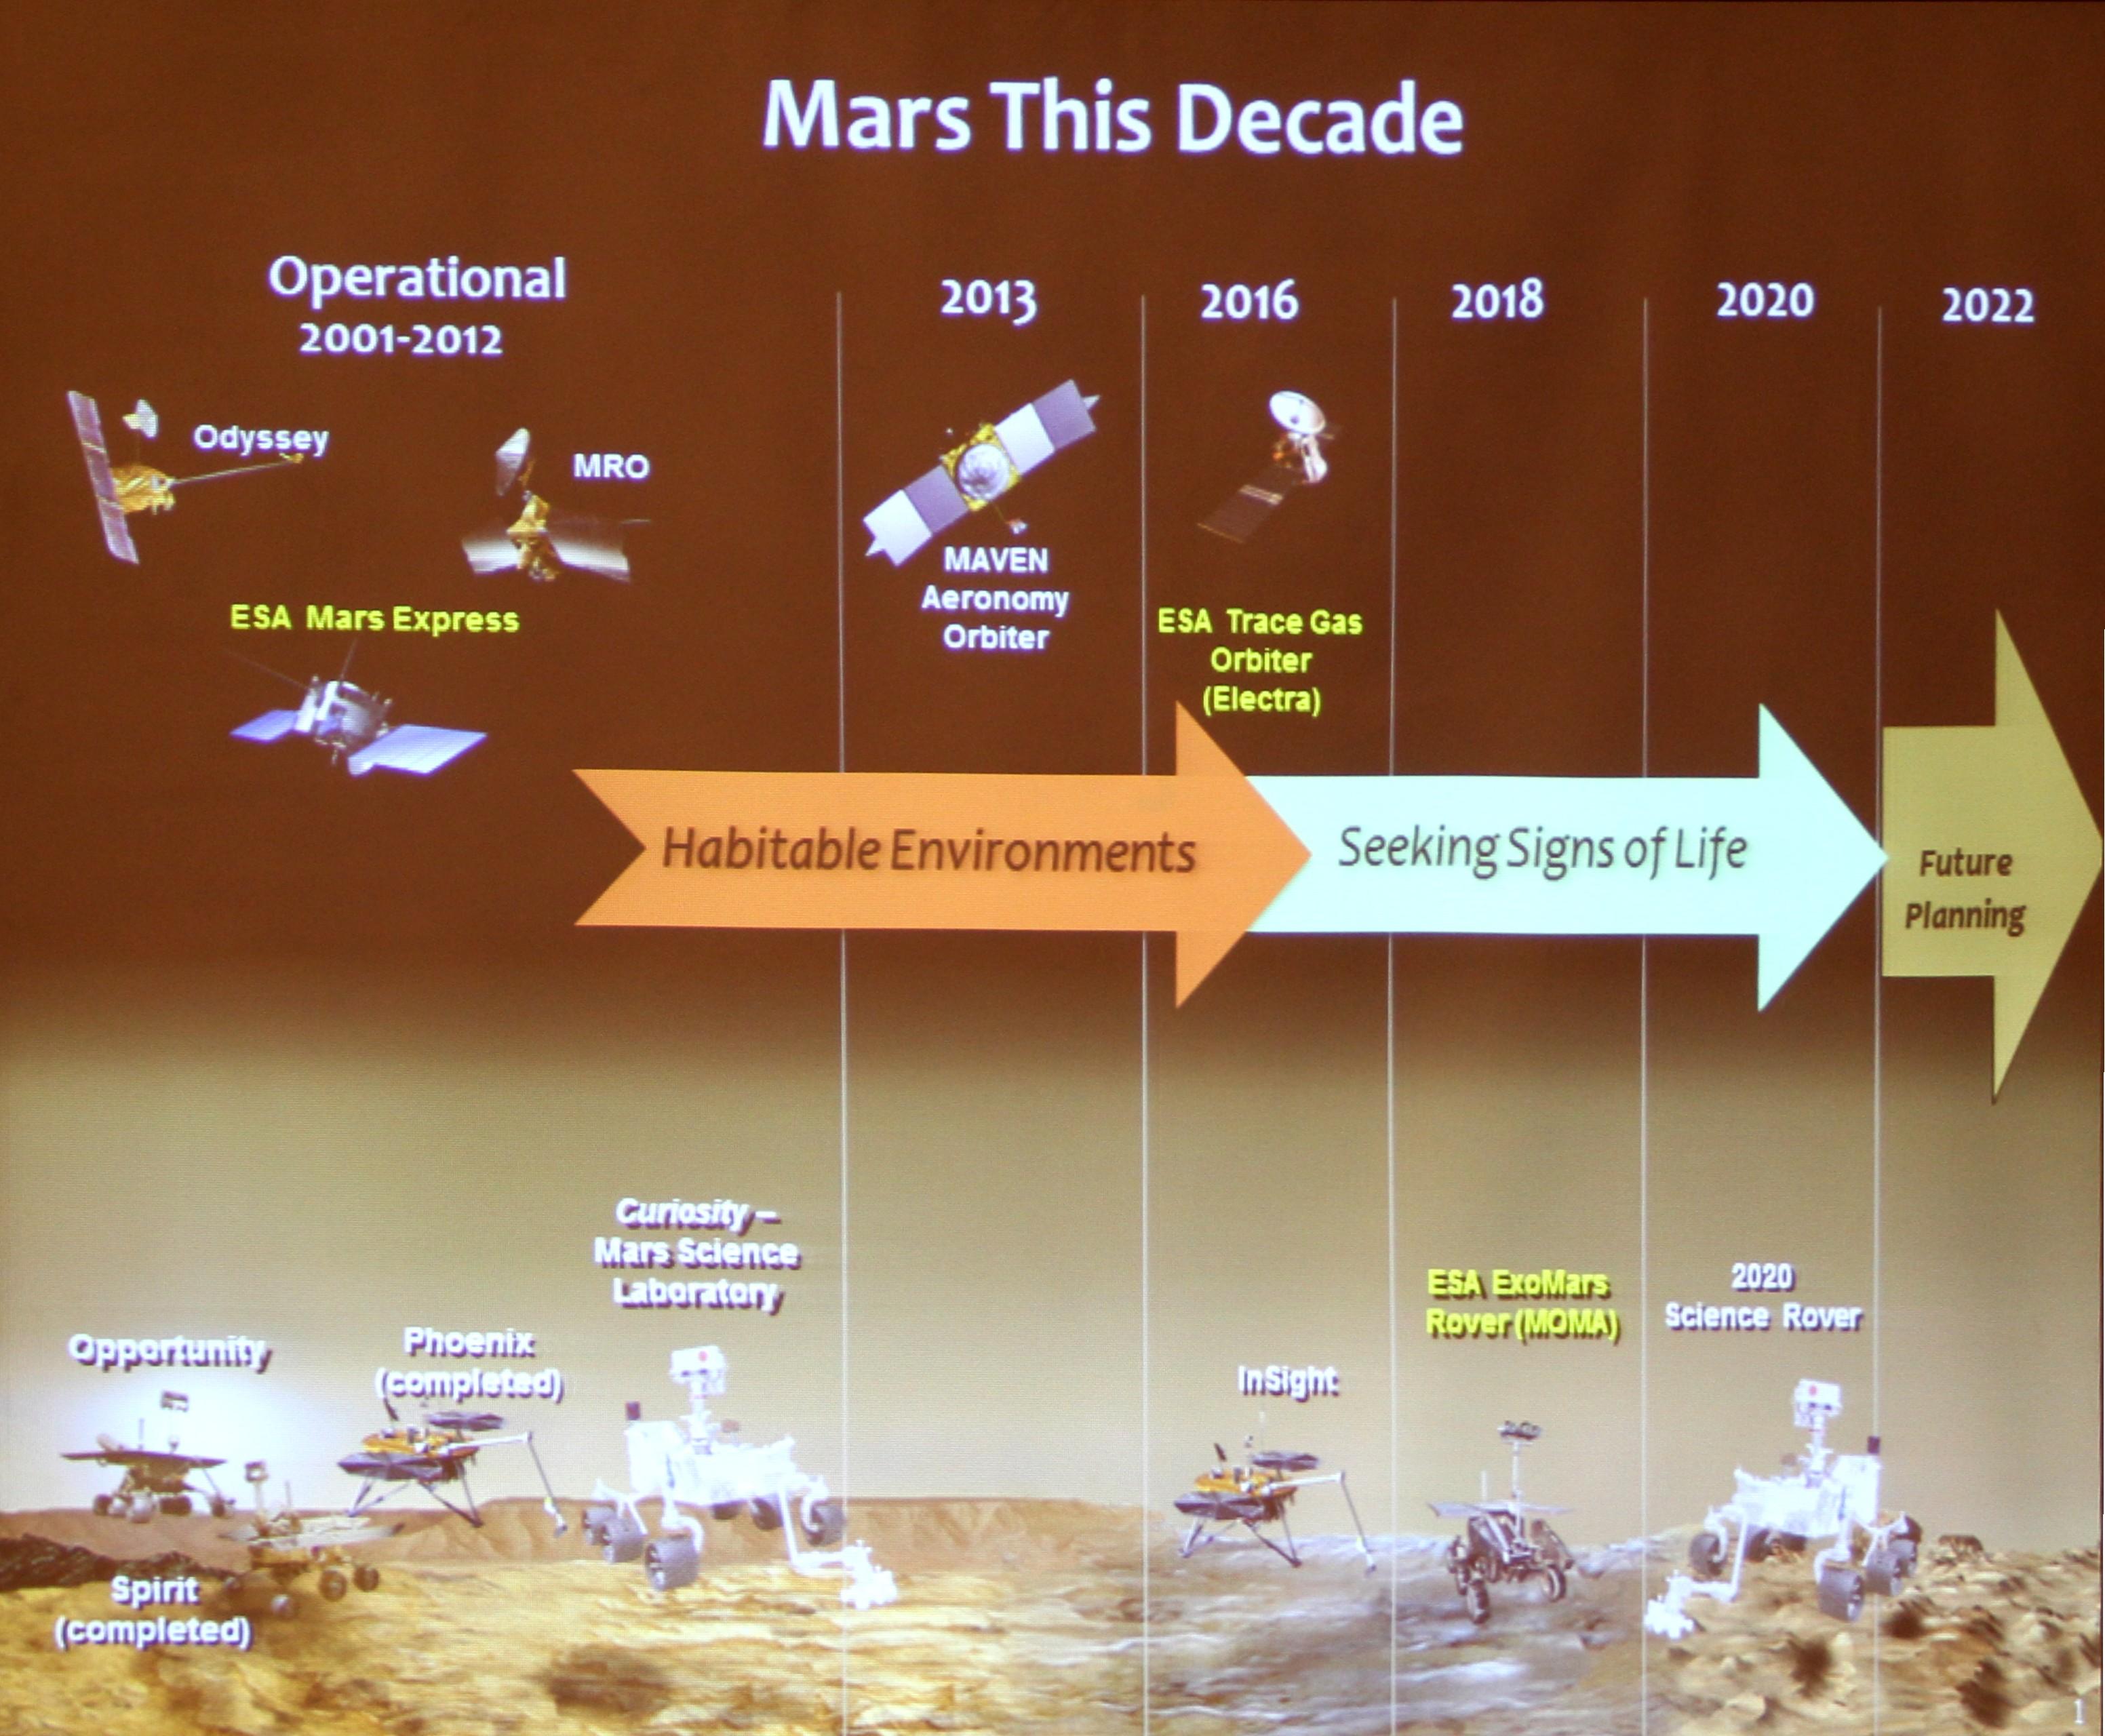 Mars this decade